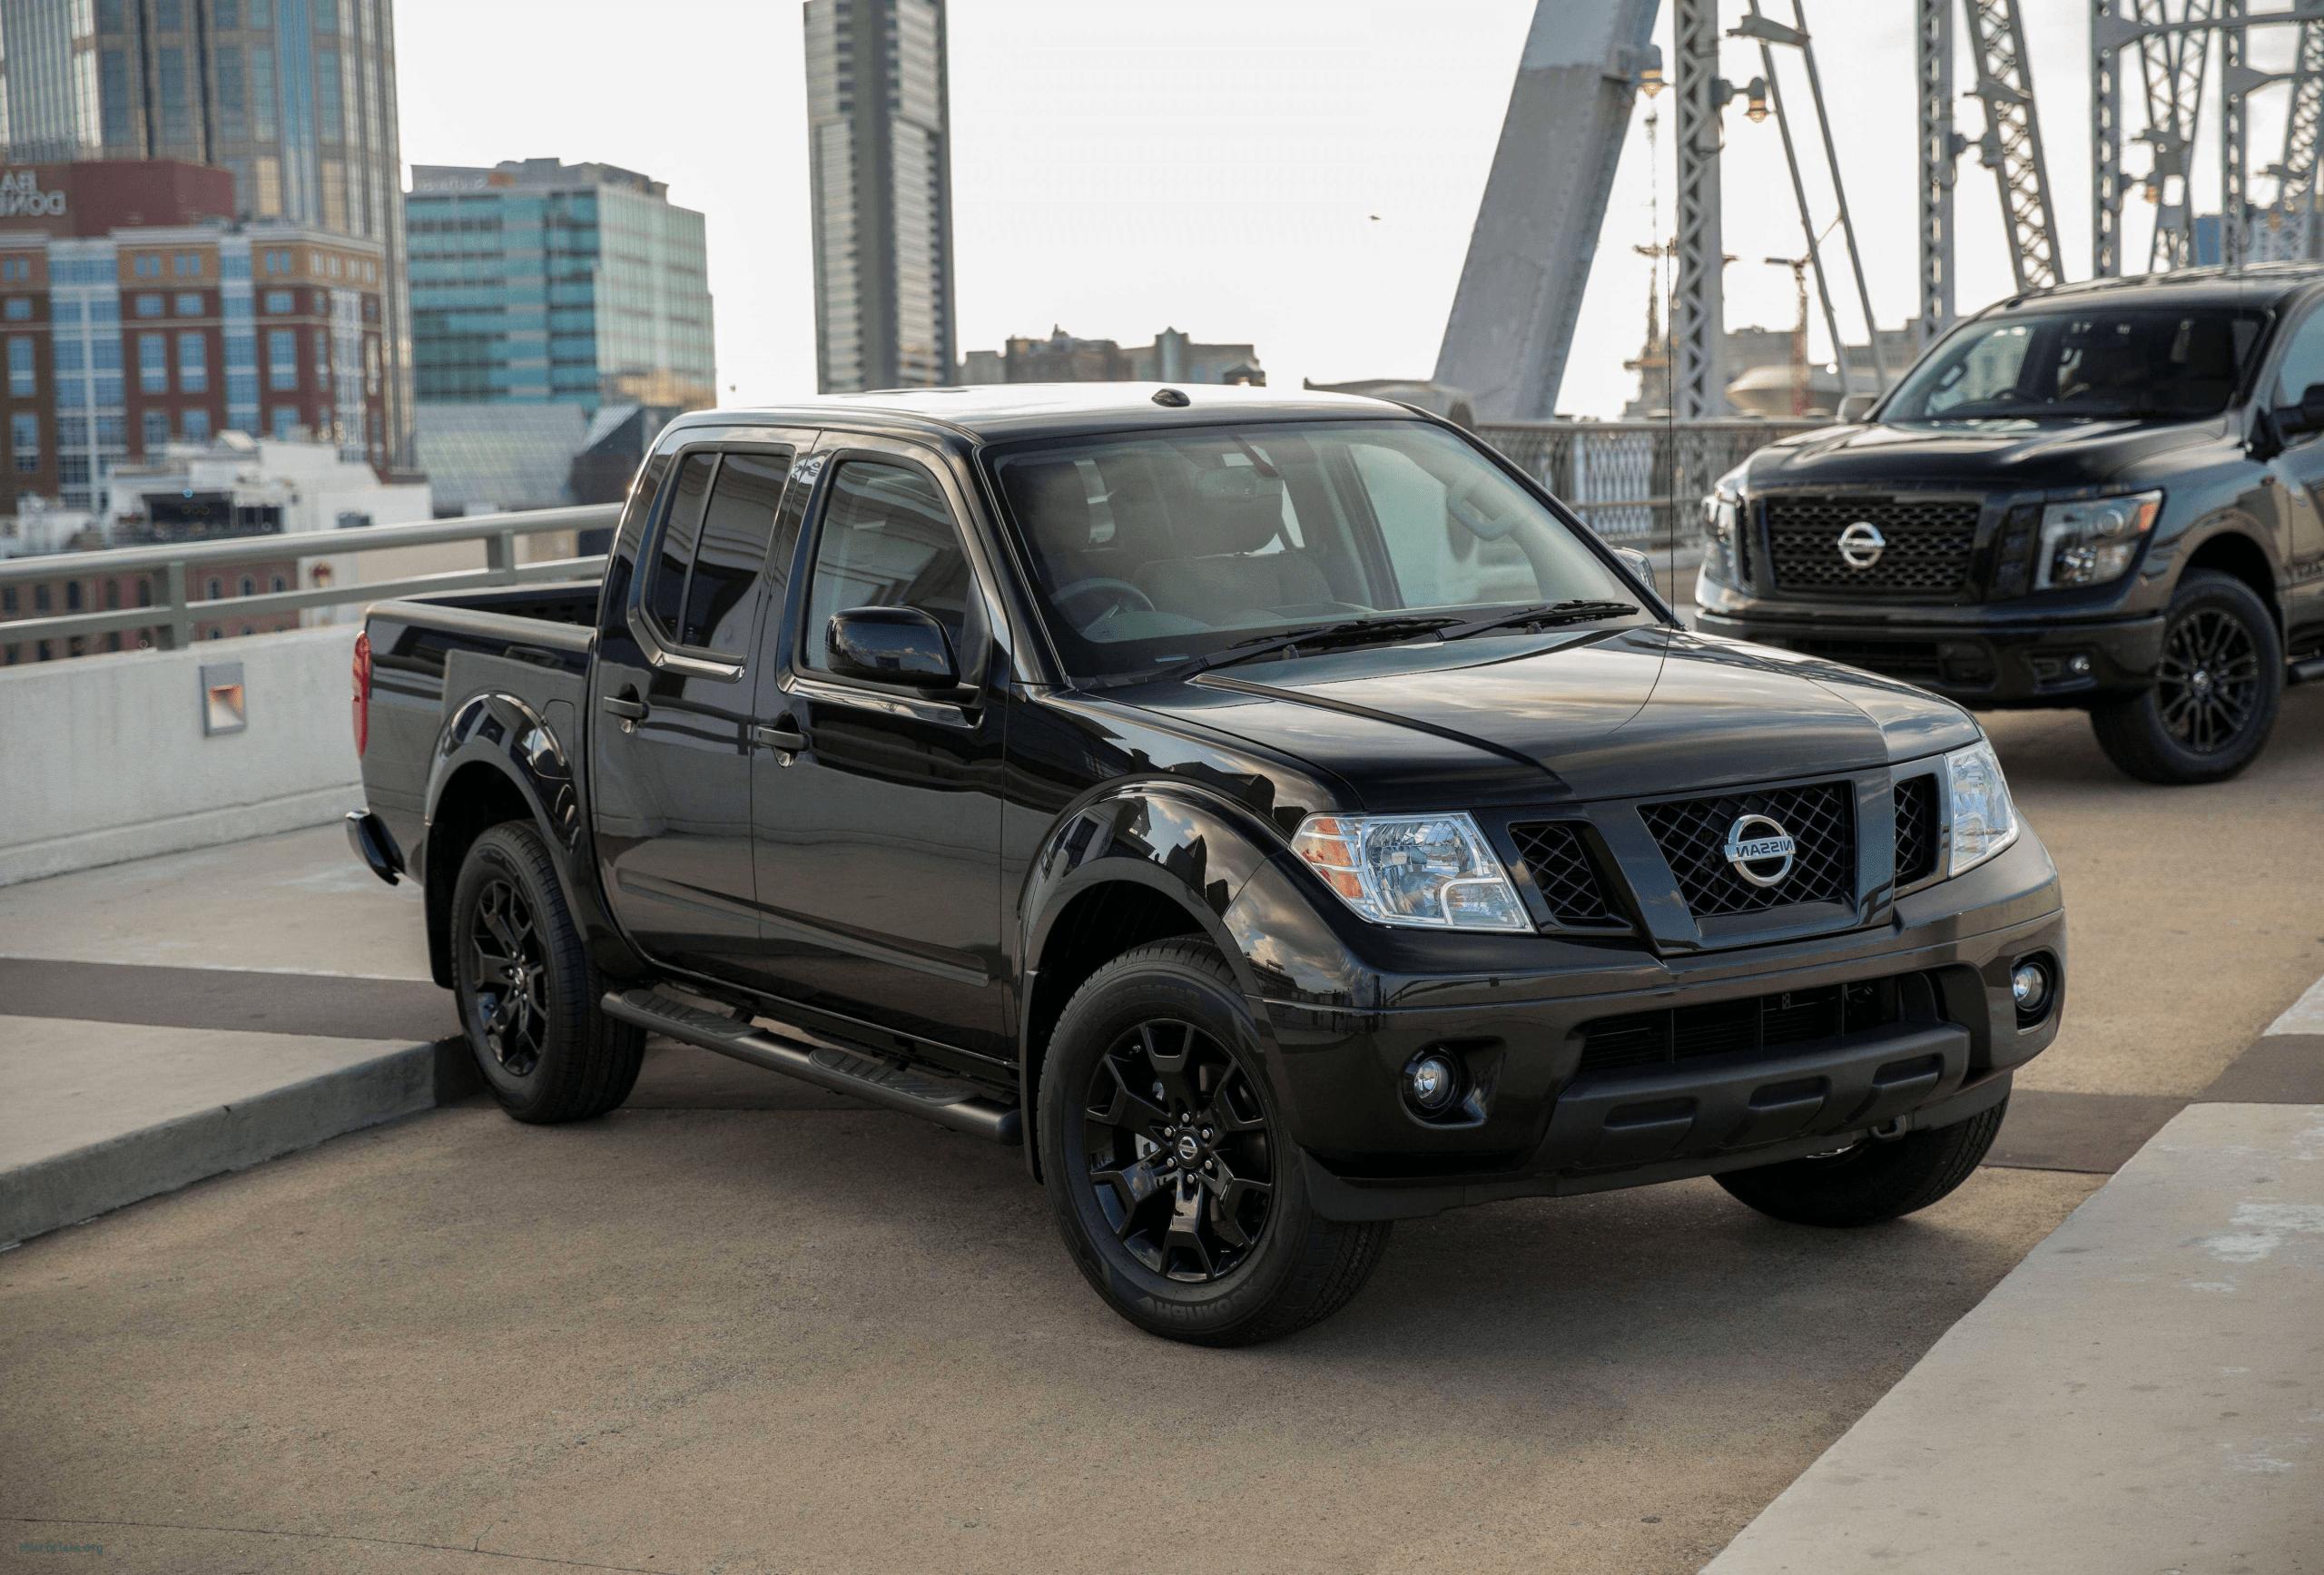 2021 Nissan Tiida Mexico Uae First Drive In 2020 Nissan Navara Nissan Xterra Nissan Patrol